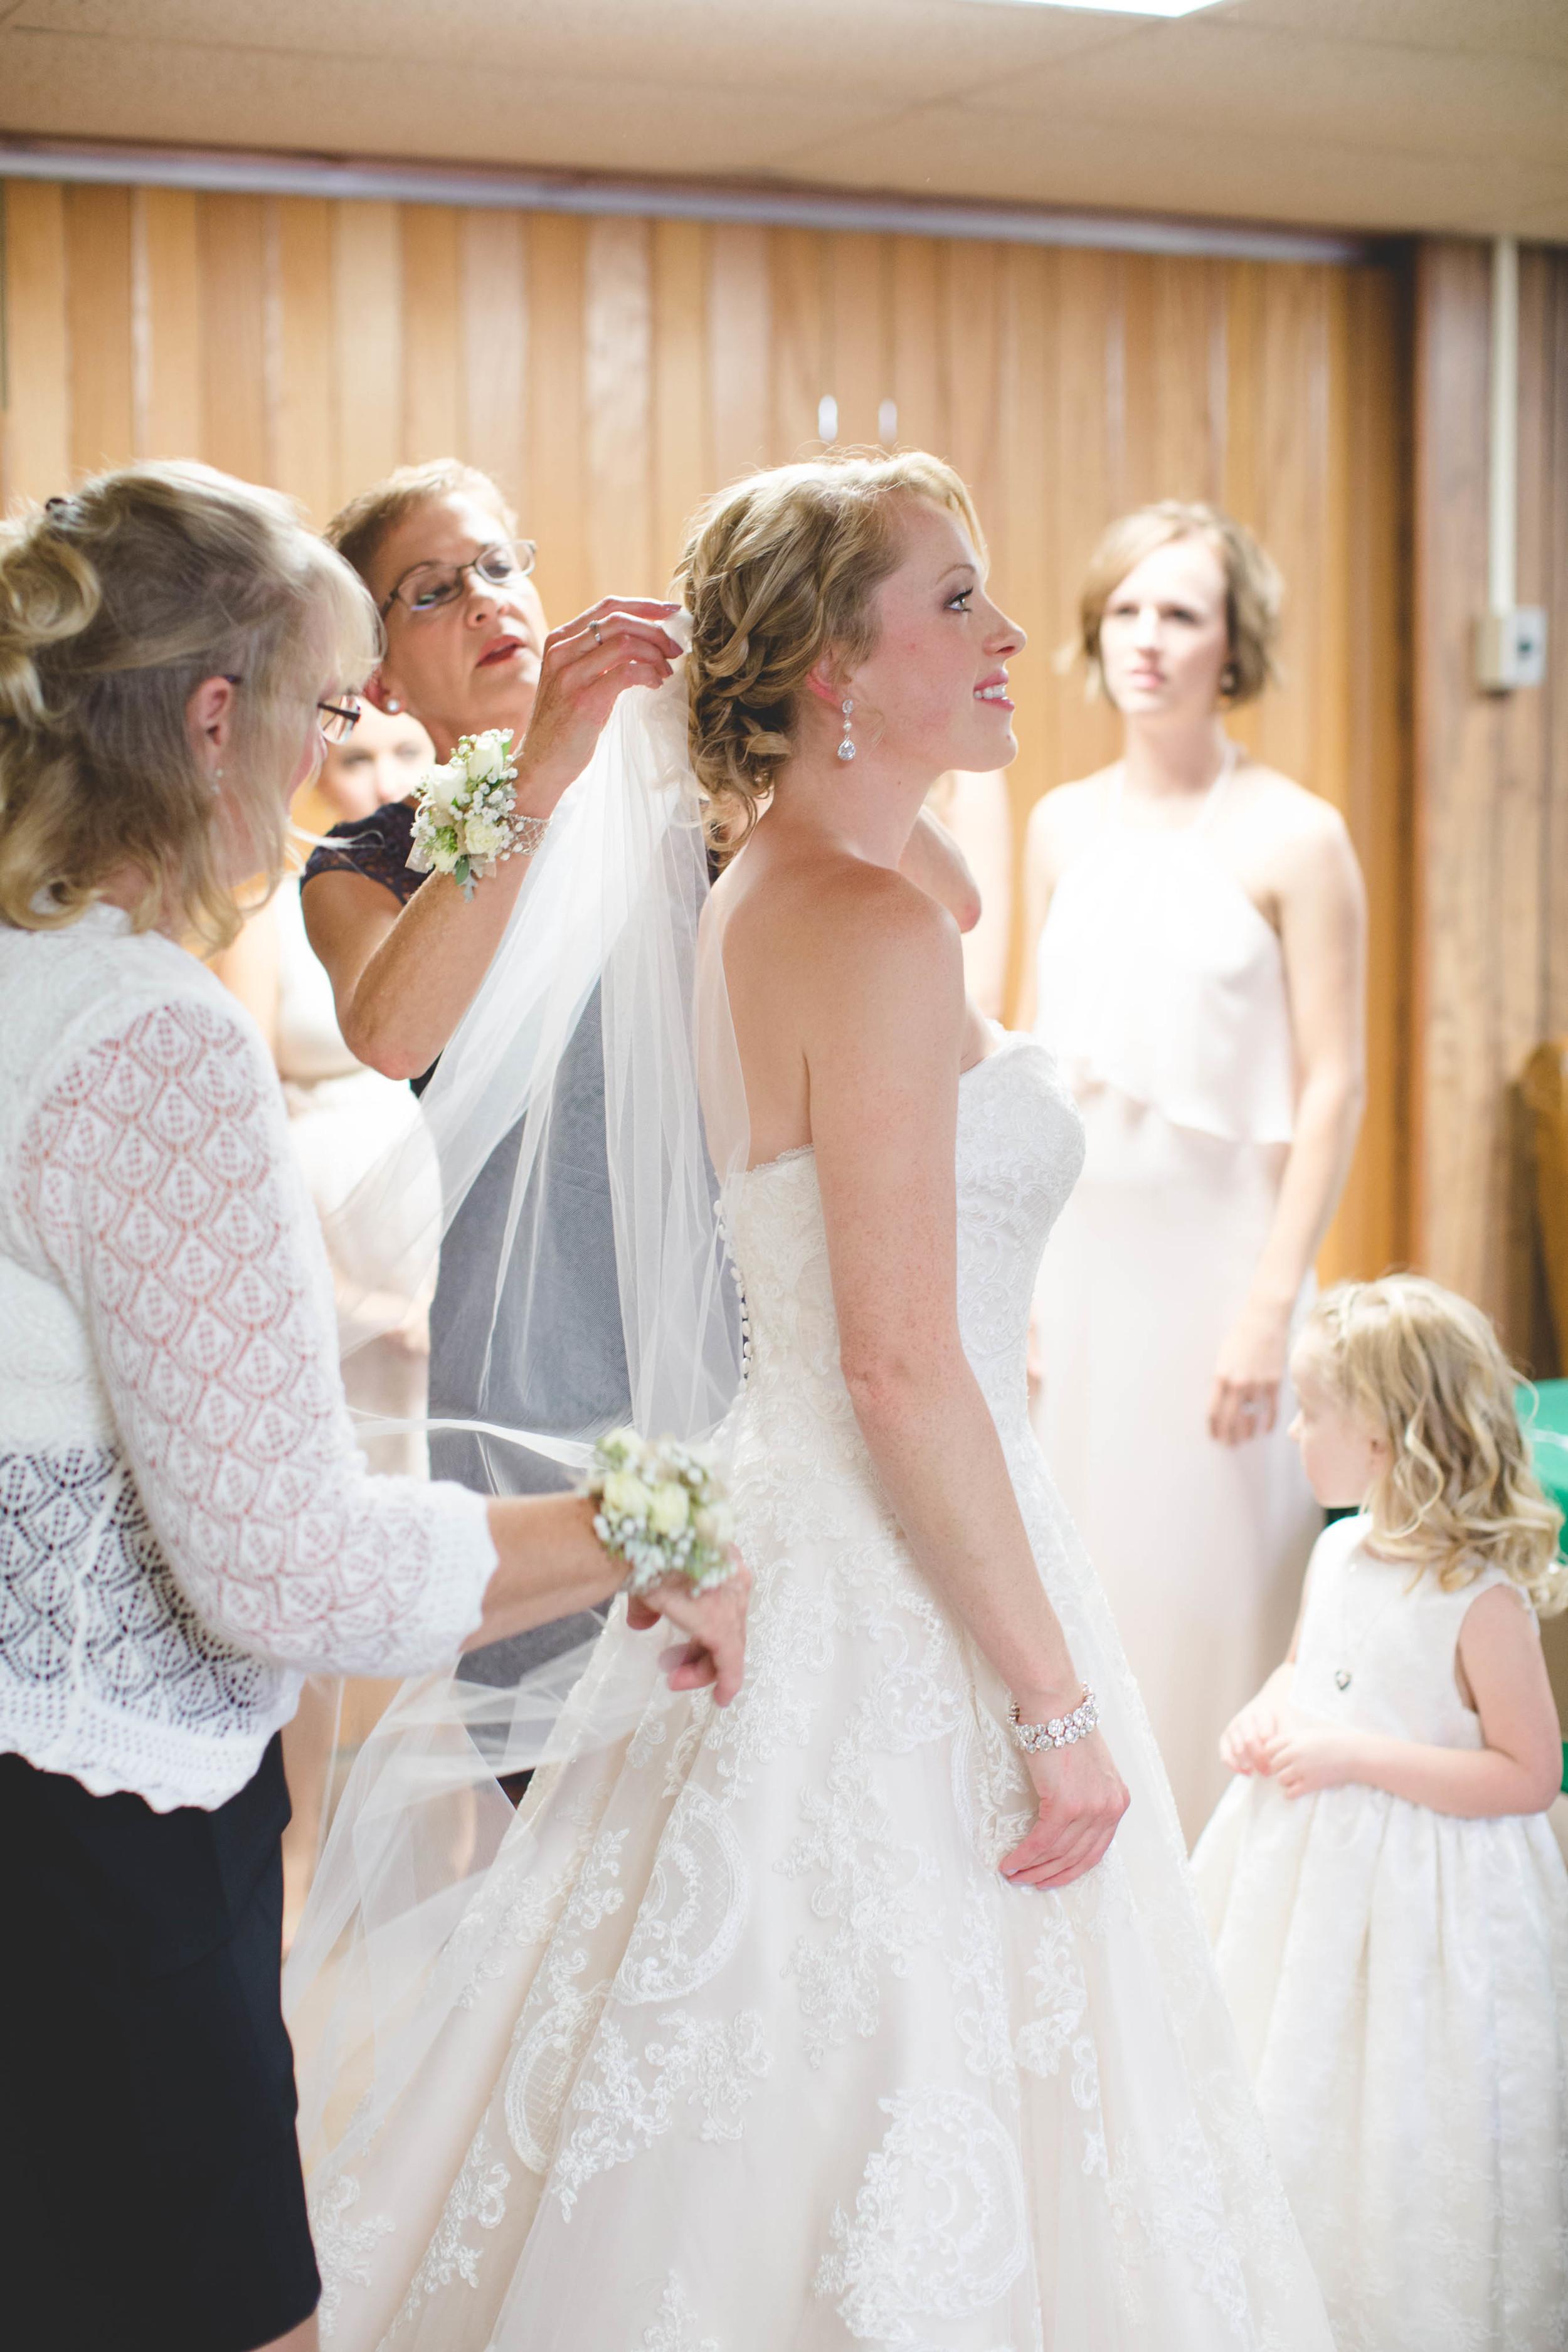 #mnwedding #mnphotographer #countrycharm #bride #gettingready